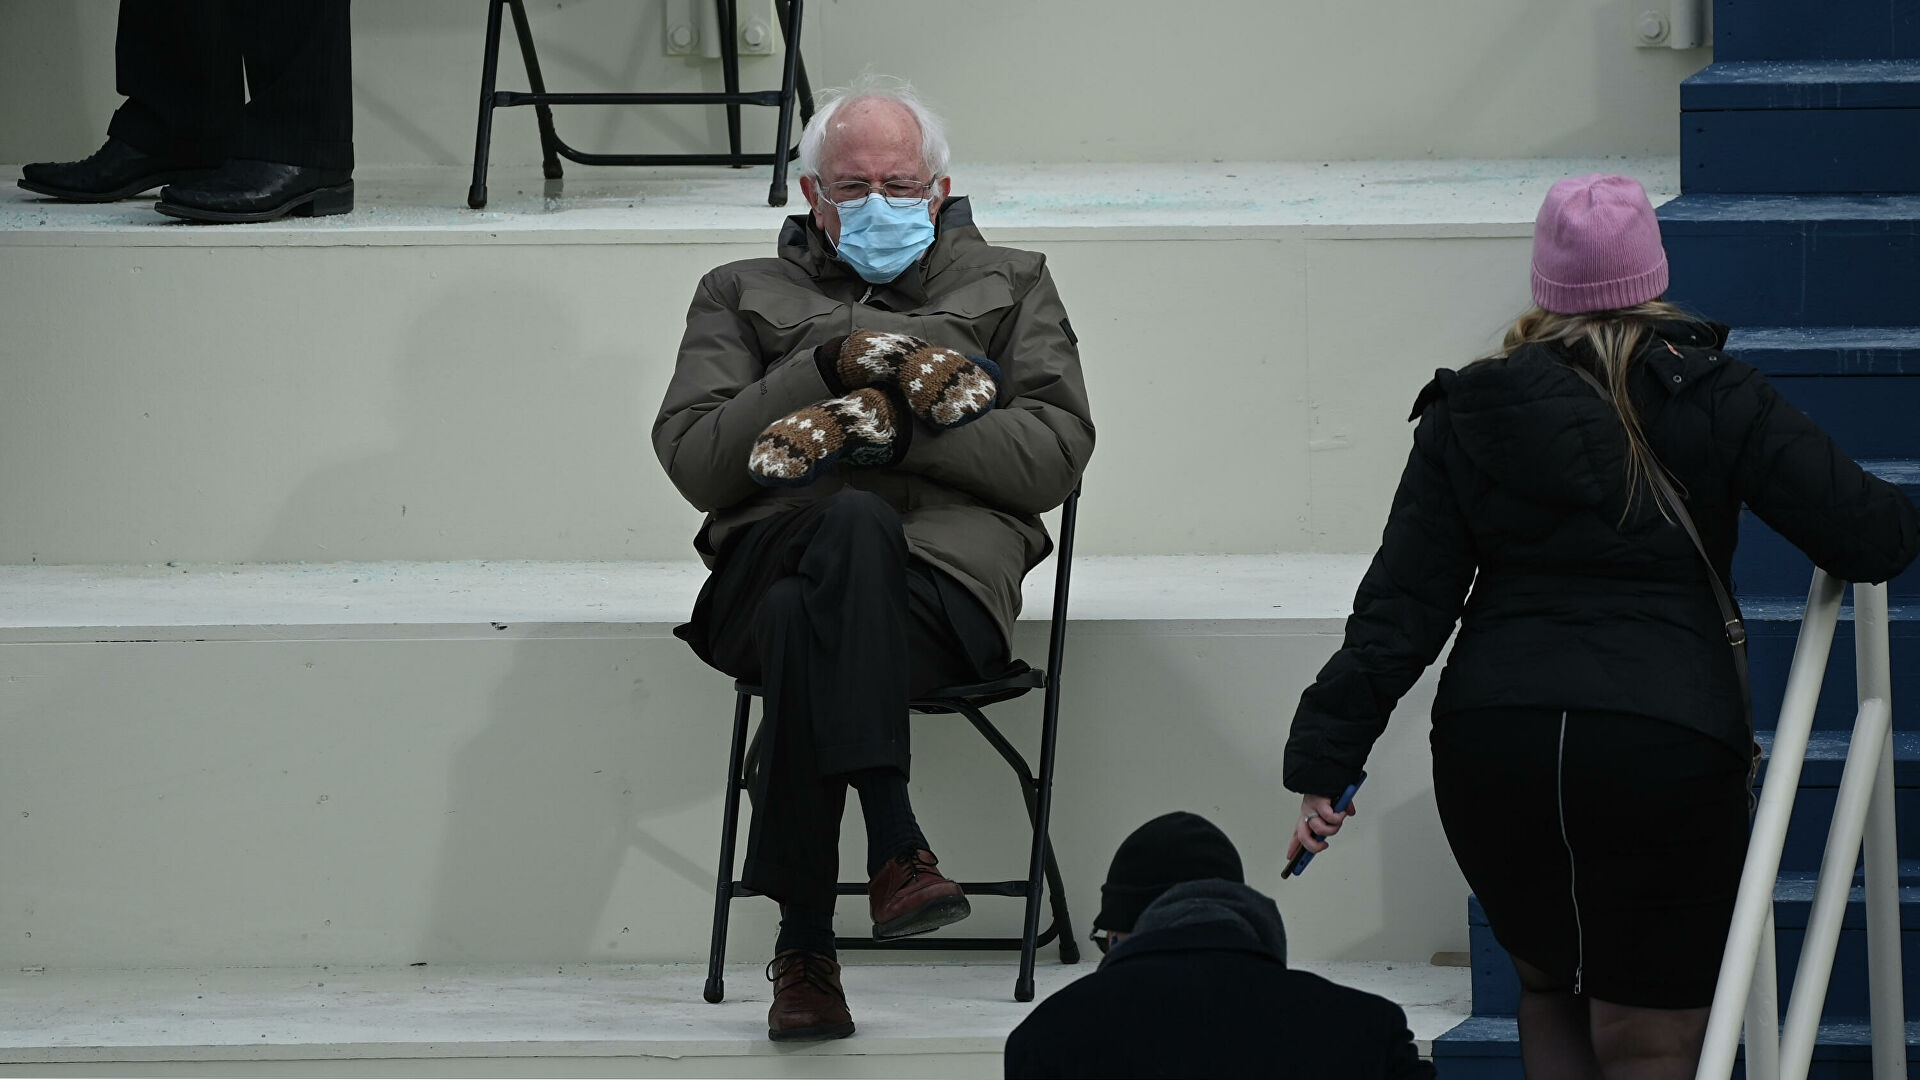 Сенатор Берни Сандер надел варежки на инаугурацию президента США: его образ взорвал Сеть и стал мемом (ФОТО) - фото №1